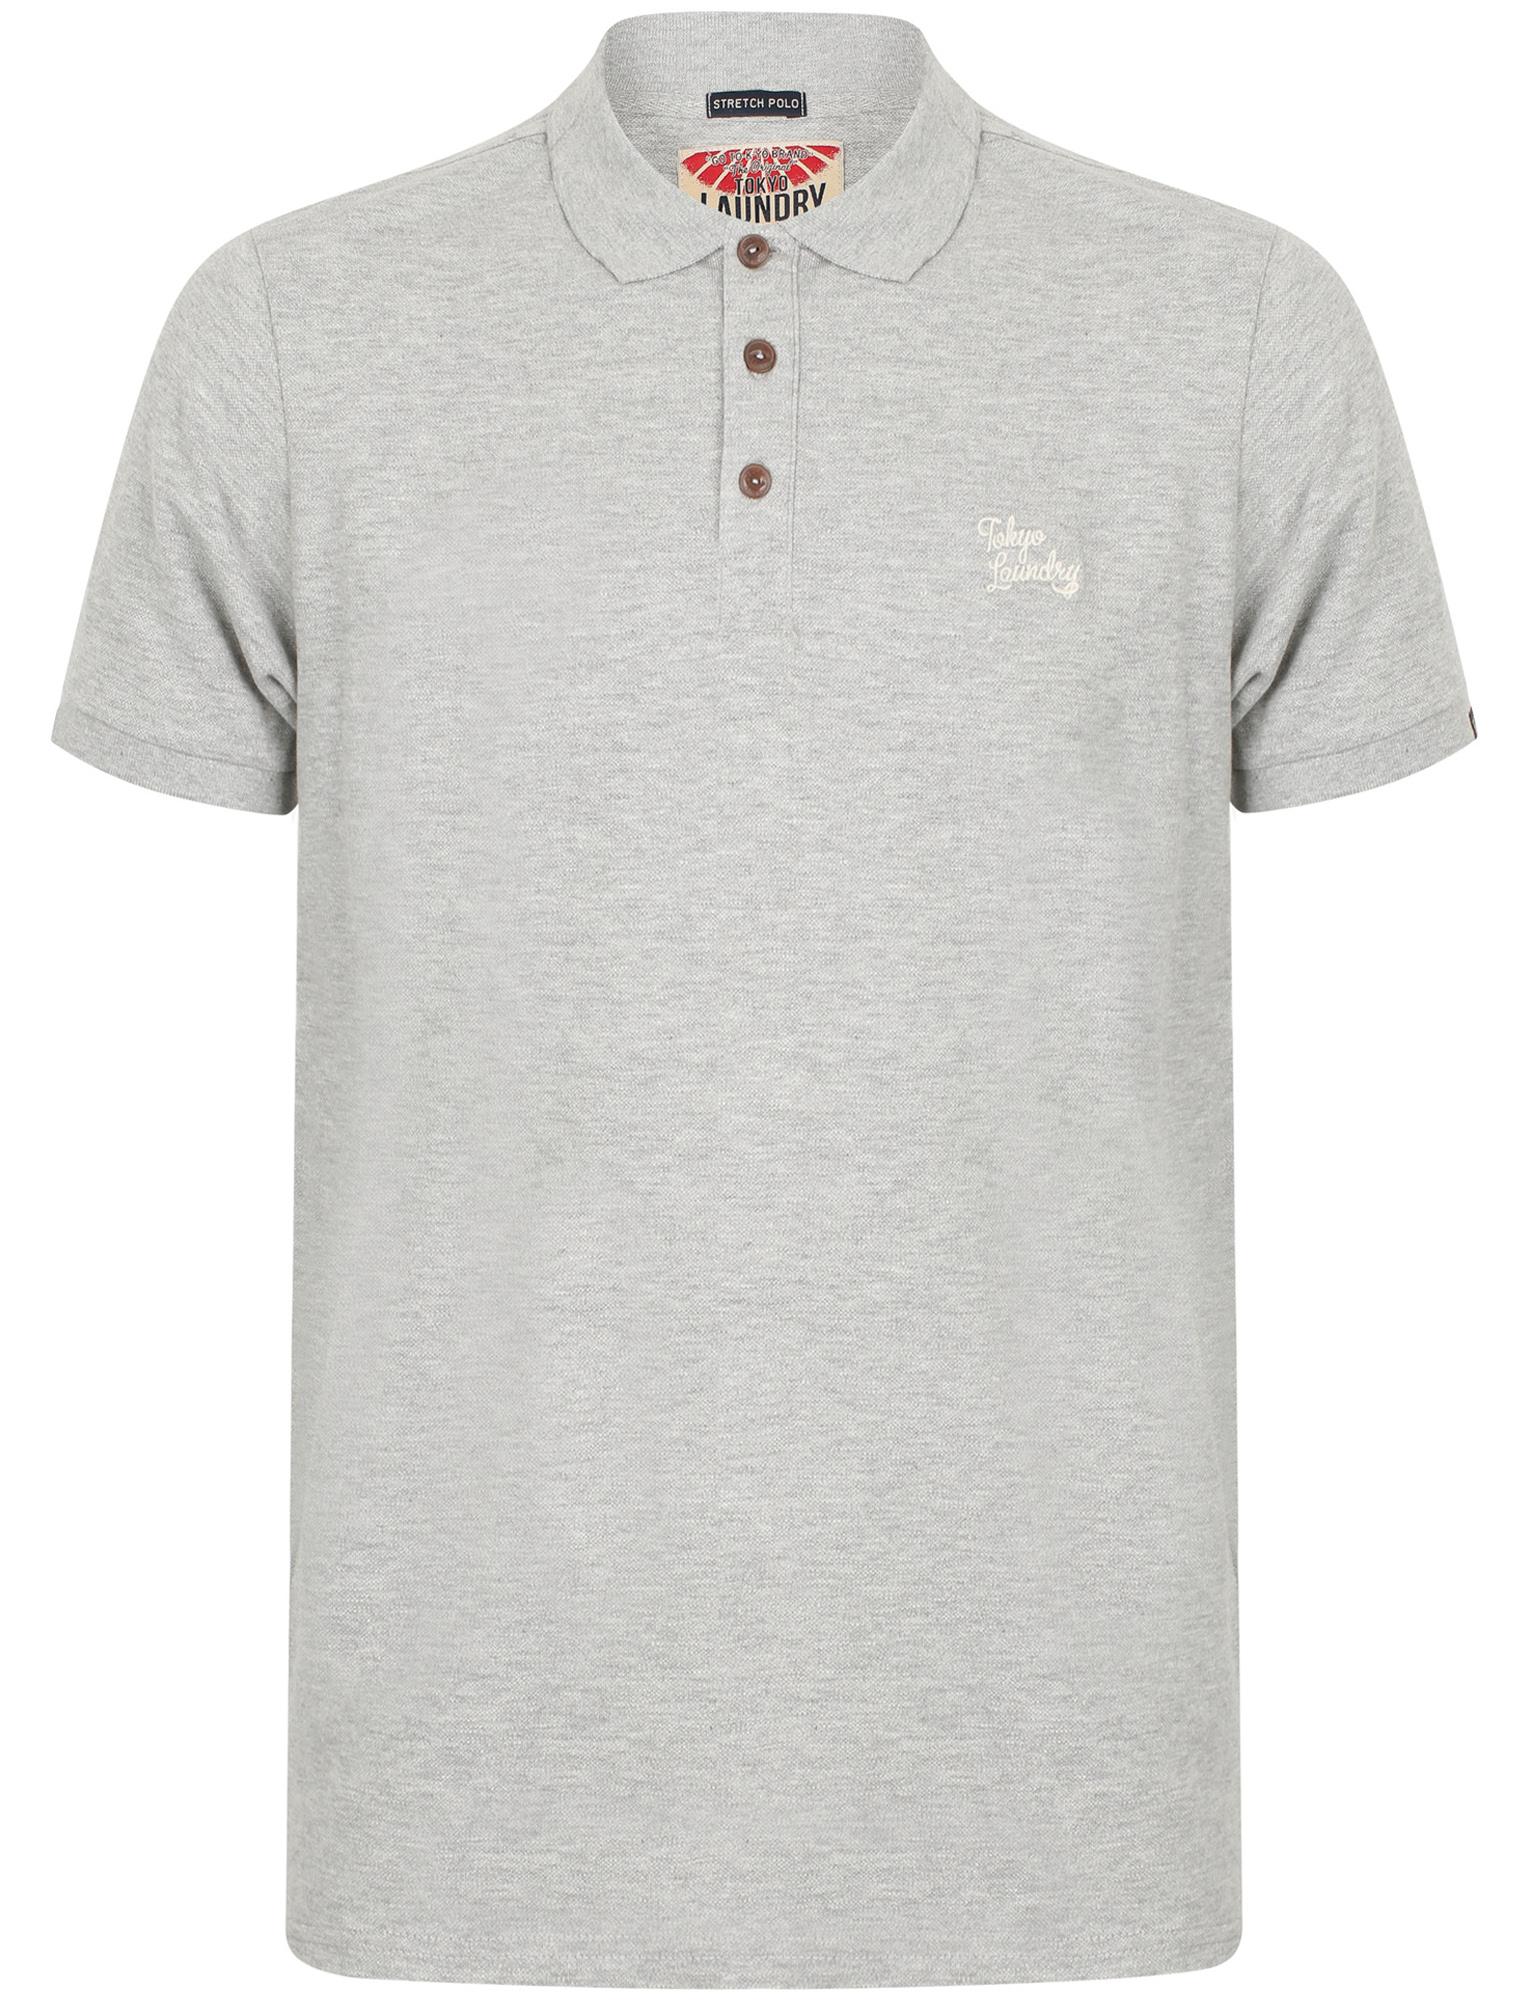 Para-Hombre-Tokyo-Laundry-Algodon-Clasico-Informal-Mangas-Cortas-Camisa-Polo-Tallas-S-XXL